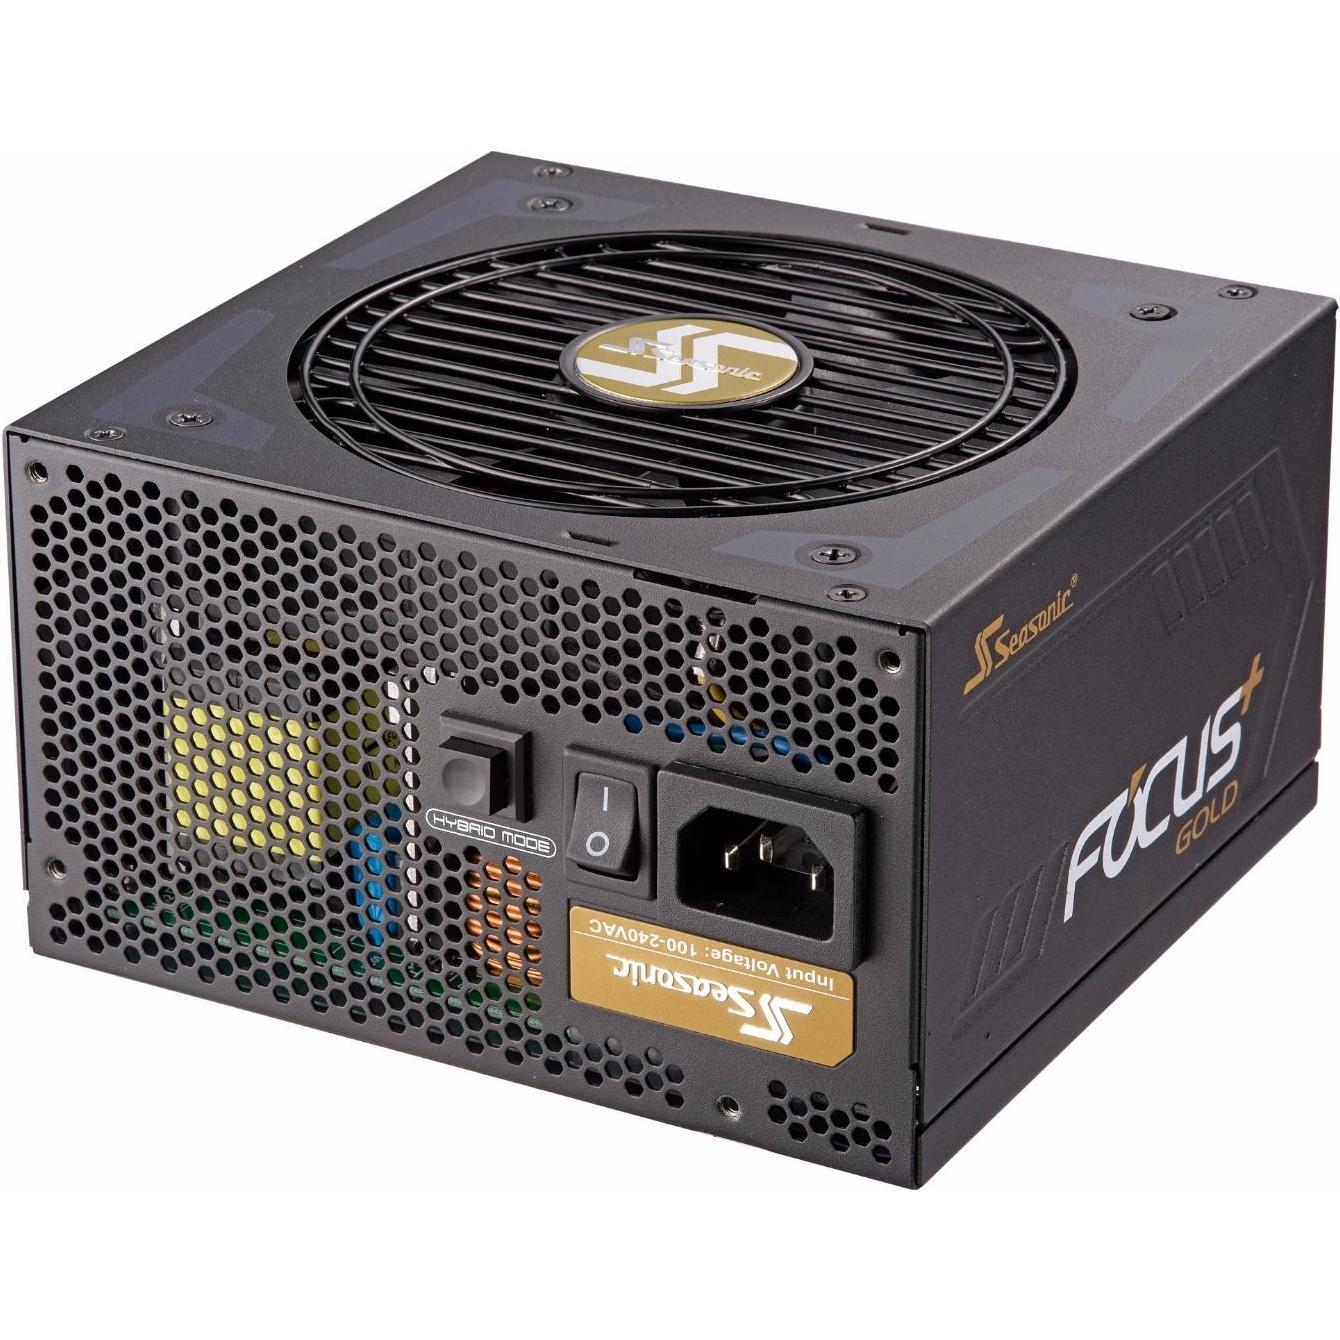 Netzteil Seasonic Focus Plus Gold 1000 Watt (80 Plus Gold, vollmodular)